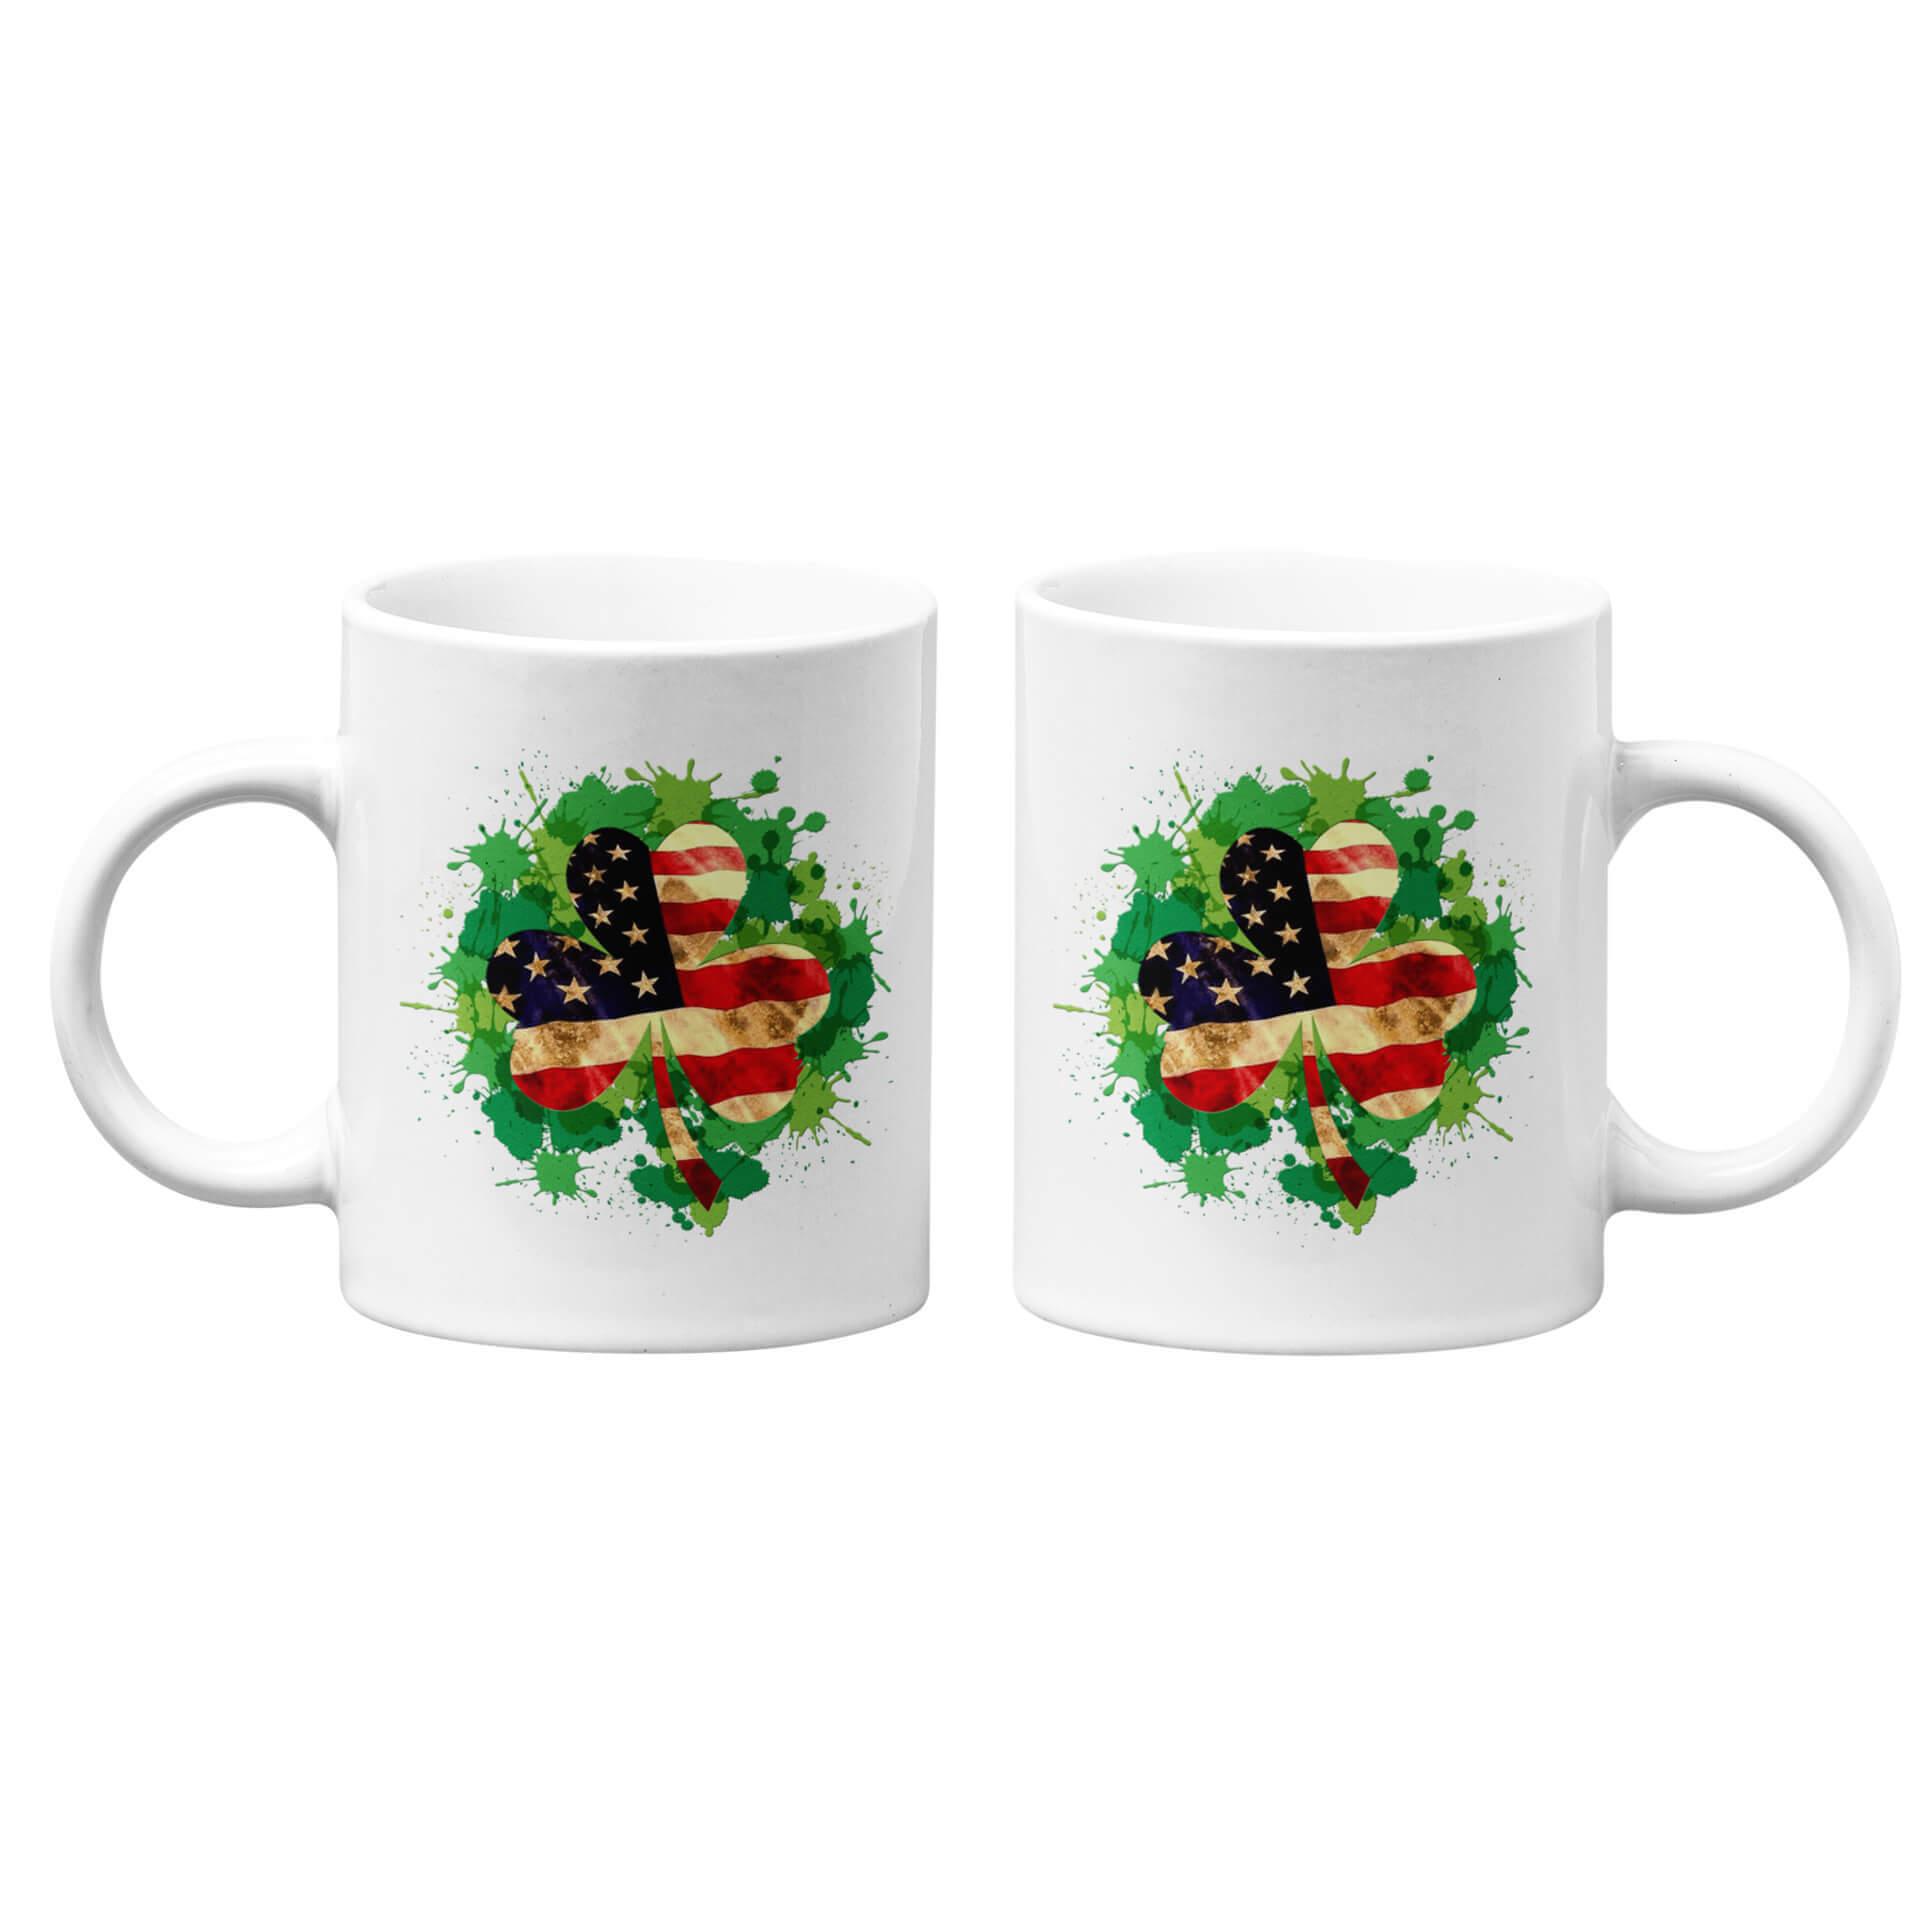 USA Flag Clover Mug